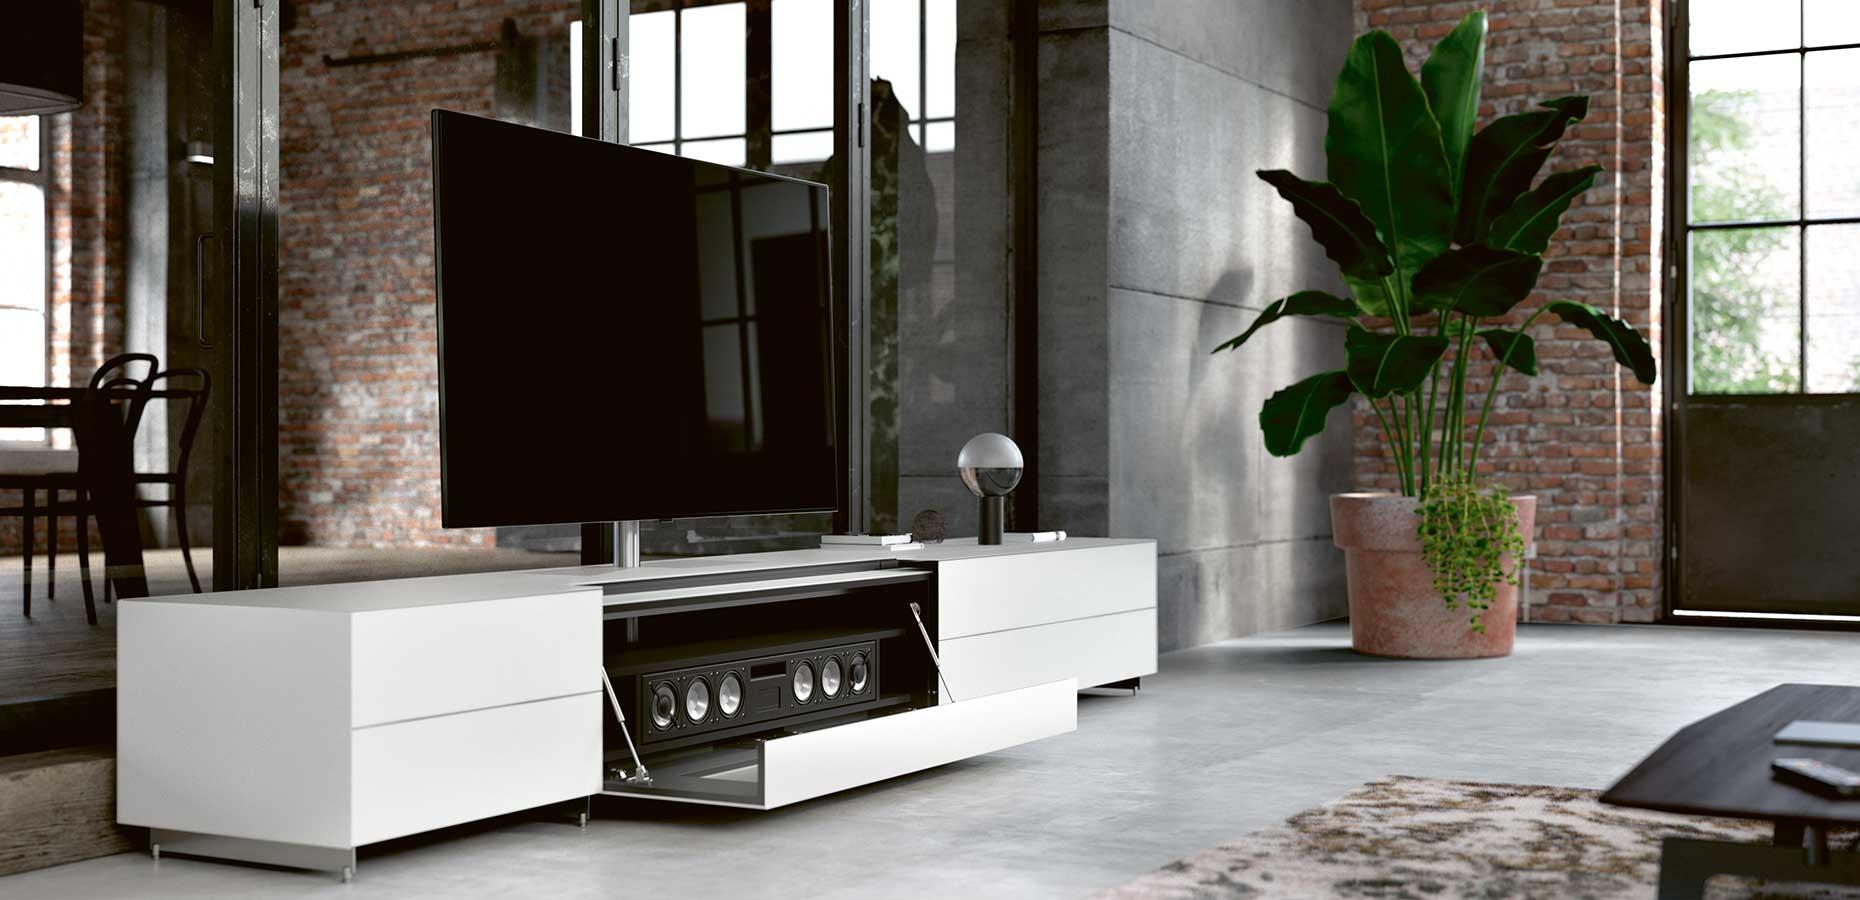 spectral sound spectral audio mobel gmbh tv mobel center lautsprecher chic mobel lowboard preisvergleich